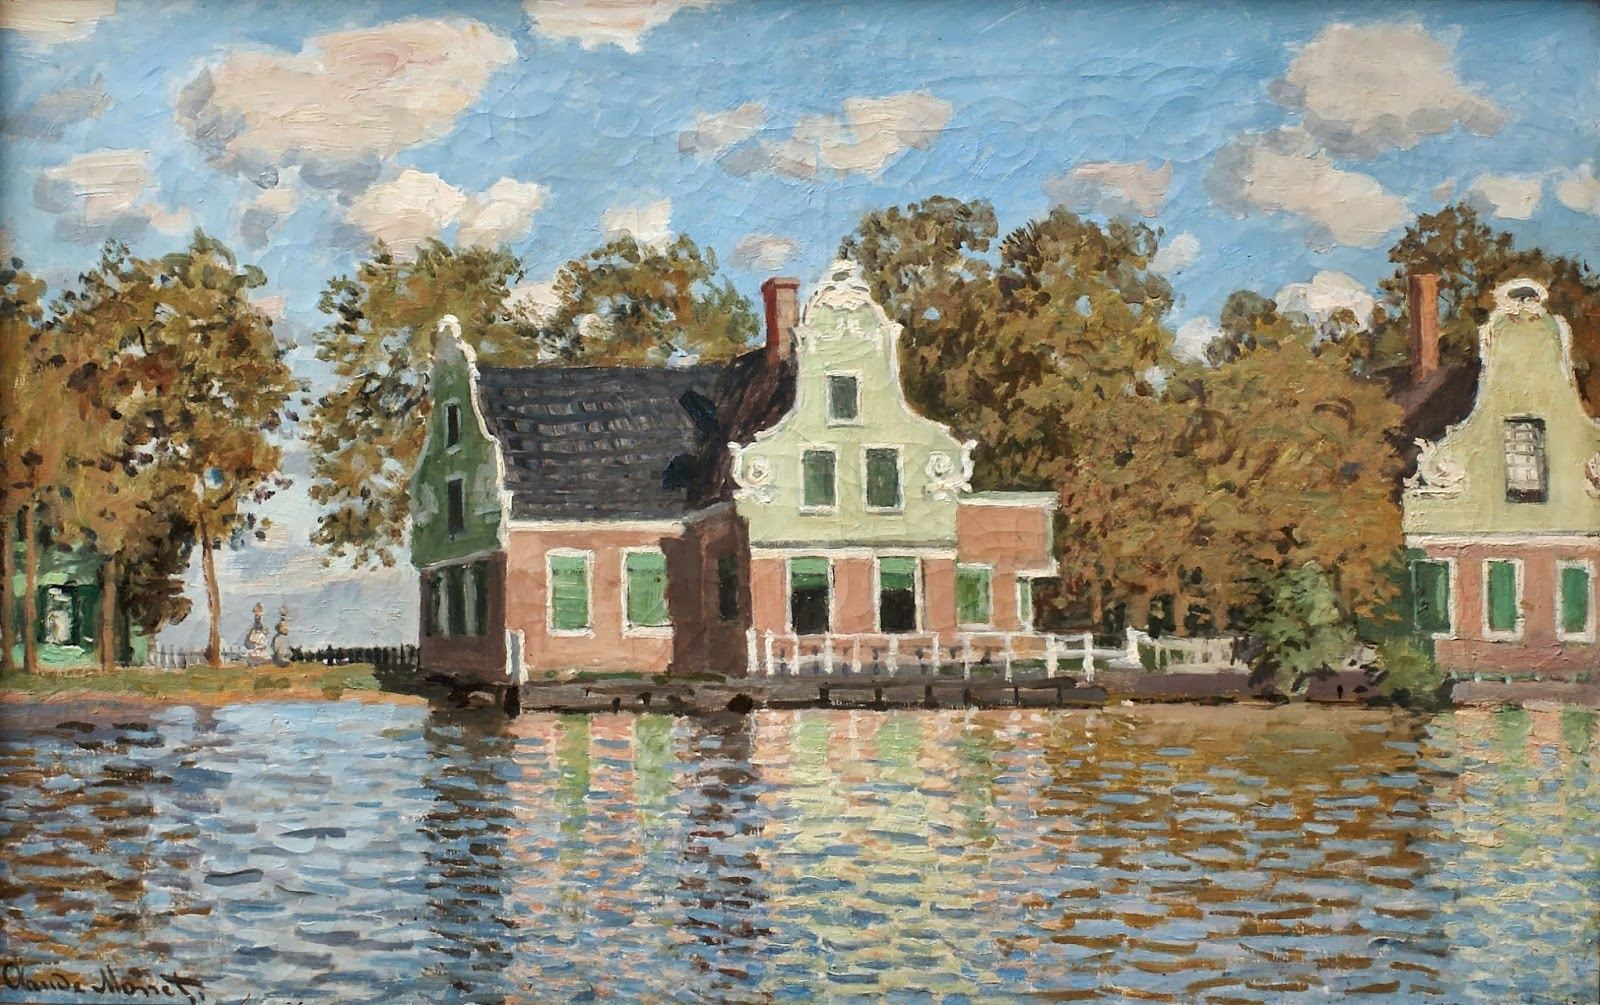 ������ ������ < ���� �� ���� ����, � ������ ������  >:: ���� ����, �������� ������� - ���� ���� (Claude Monet) ����